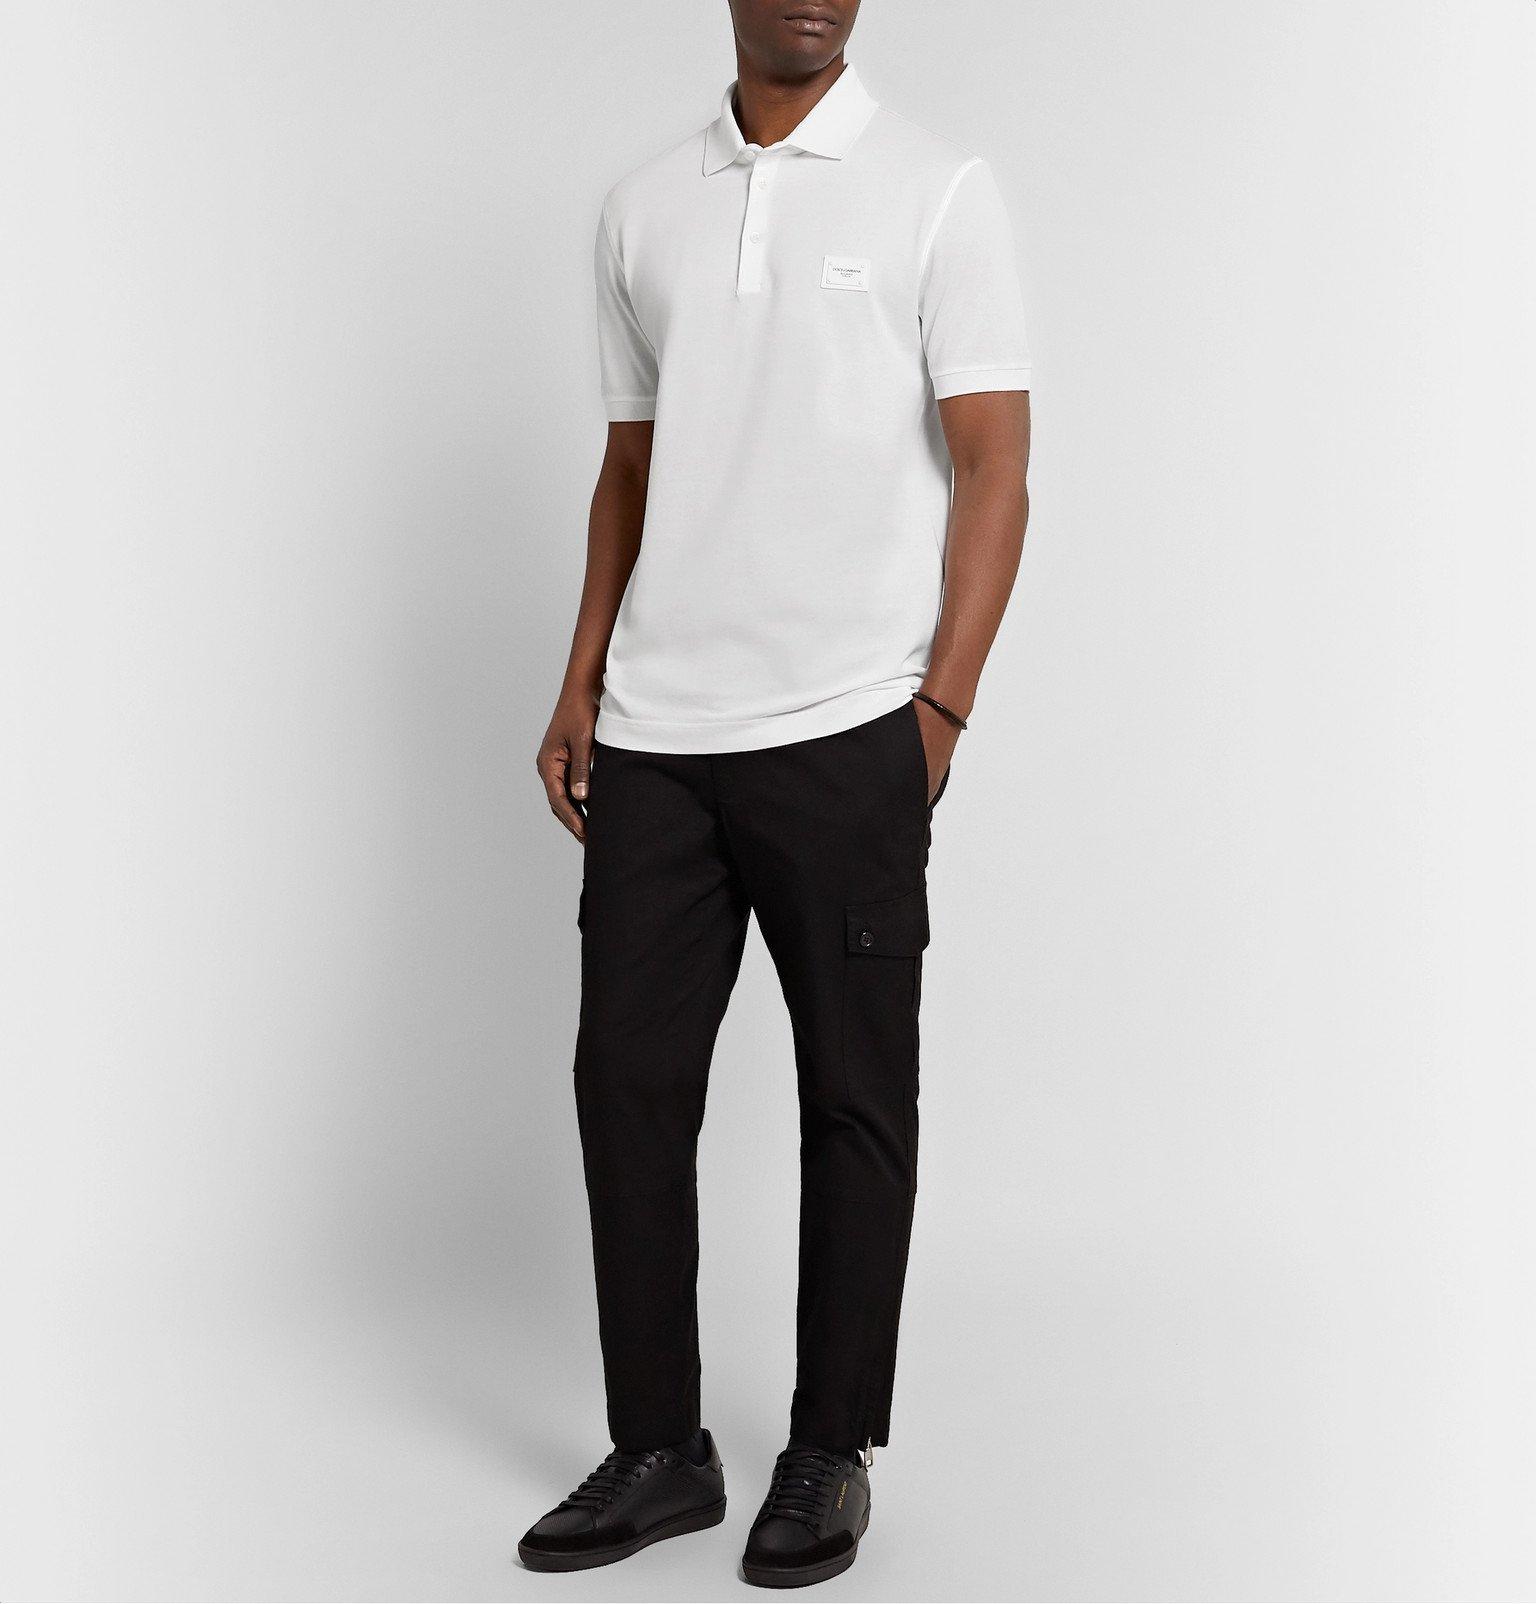 Dolce & Gabbana - Slim-Fit Logo-Appliquéd Cotton-Piqué Polo Shirt - White